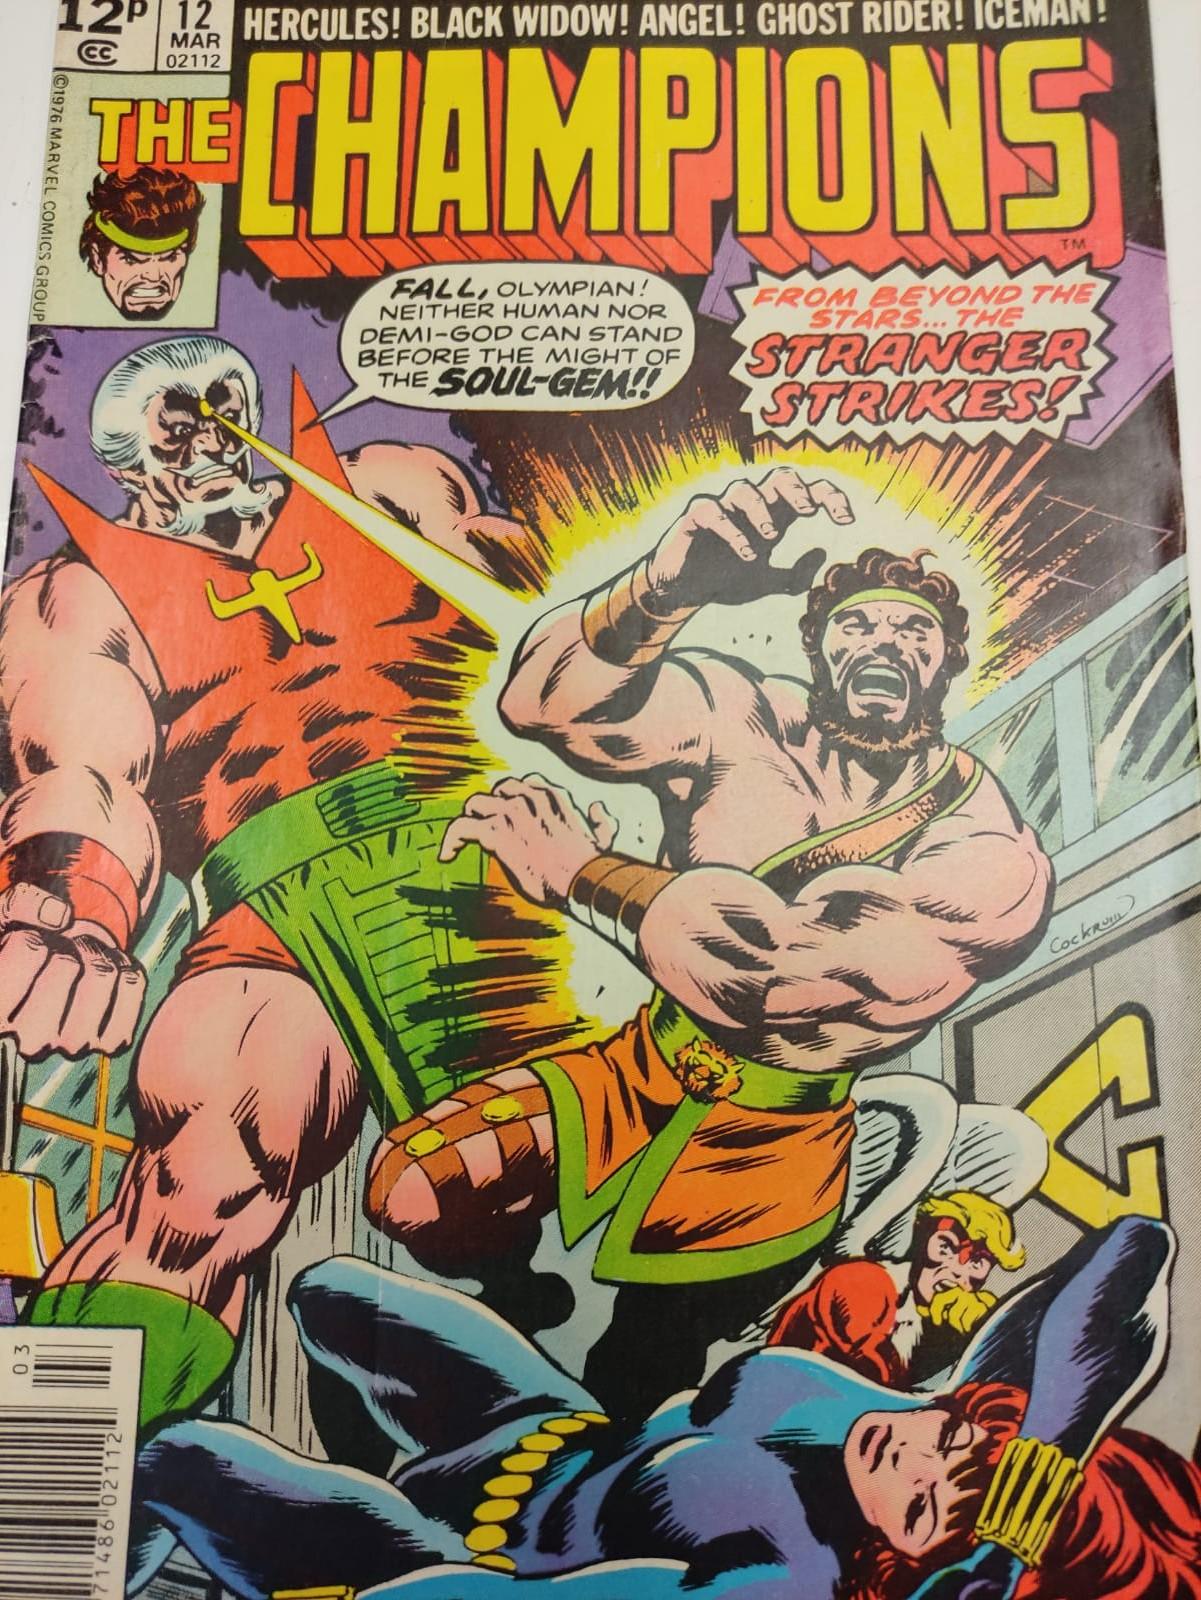 9 Copies of Vintage Marvel 'The Champion' Comics. - Image 12 of 14